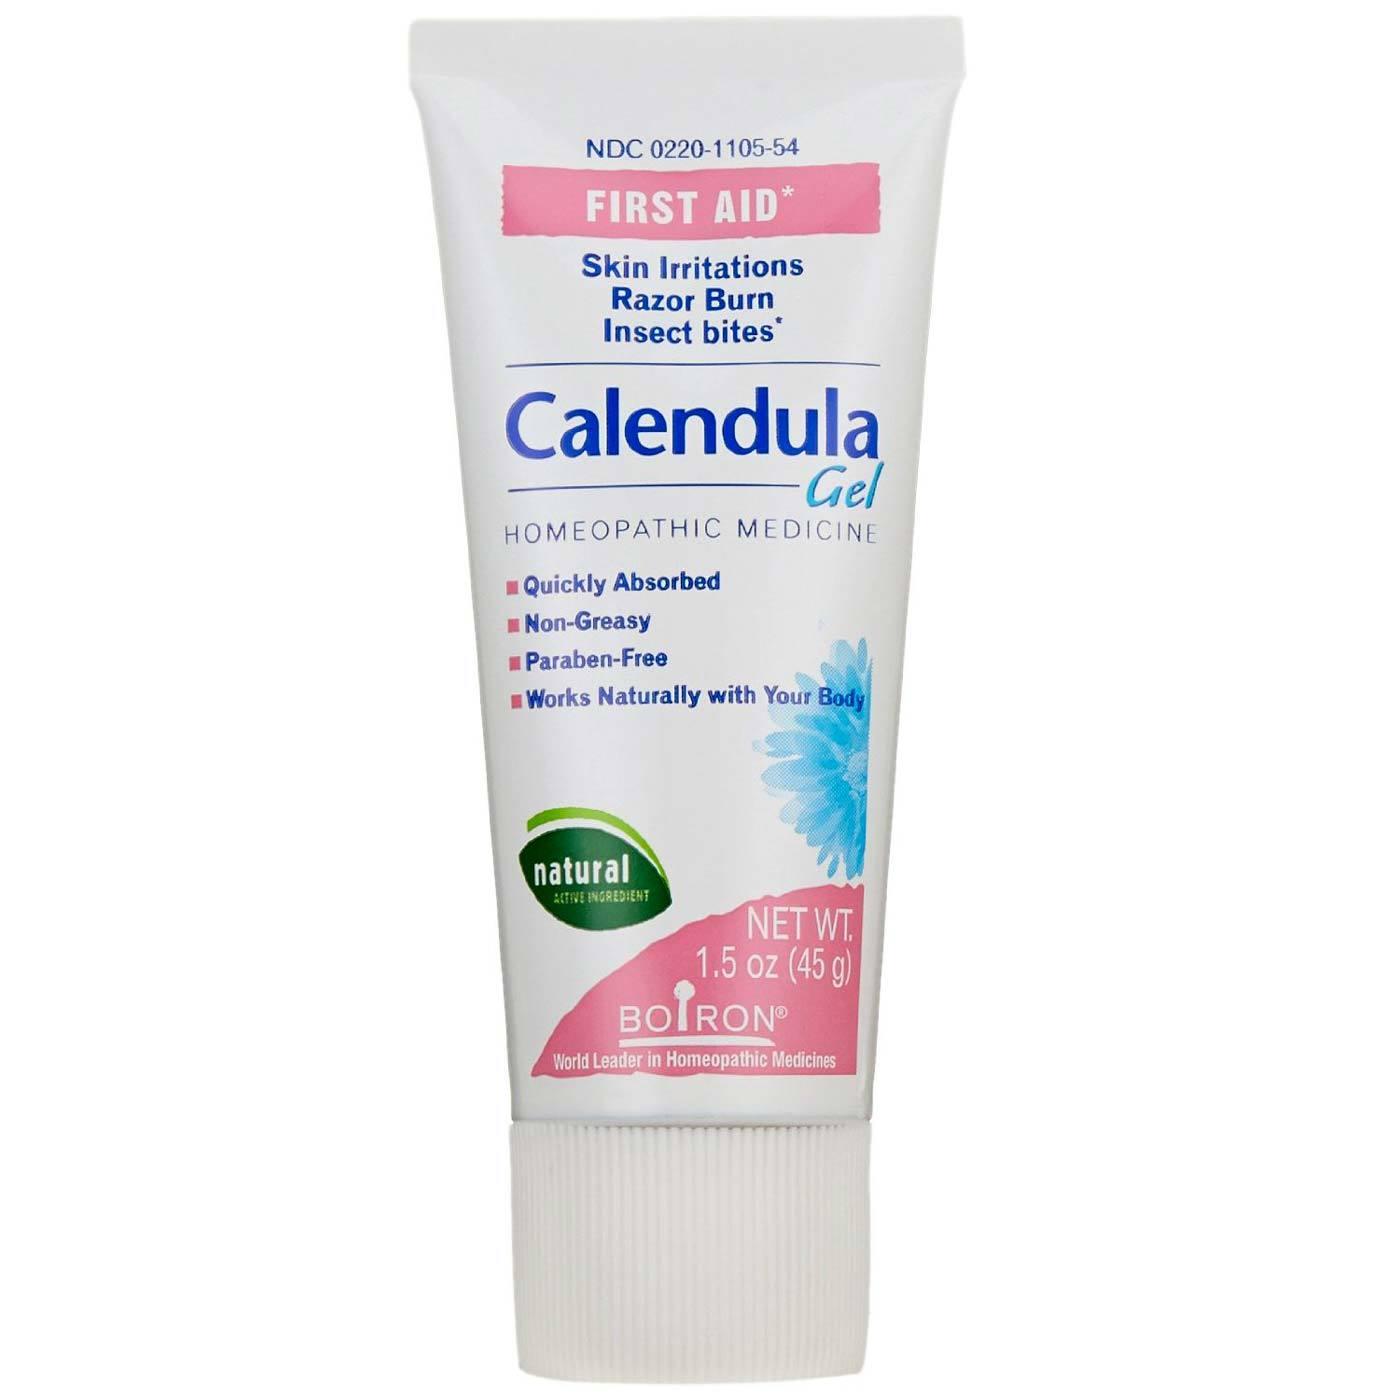 Boiron Calendula Gel